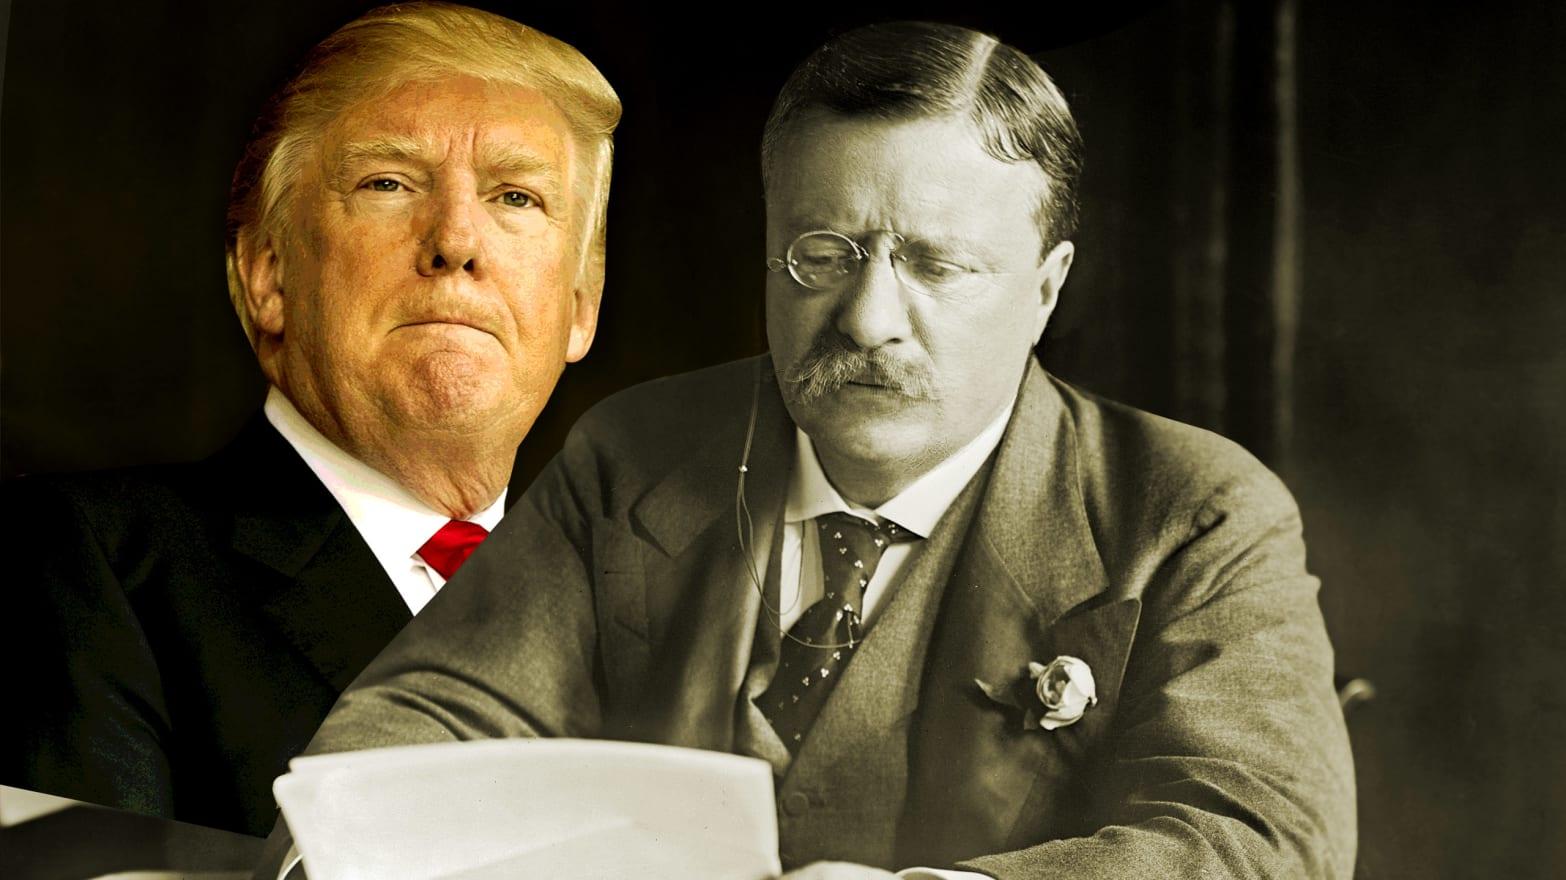 Uh, John Boehner: Trump Is the Opposite of Teddy Roosevelt